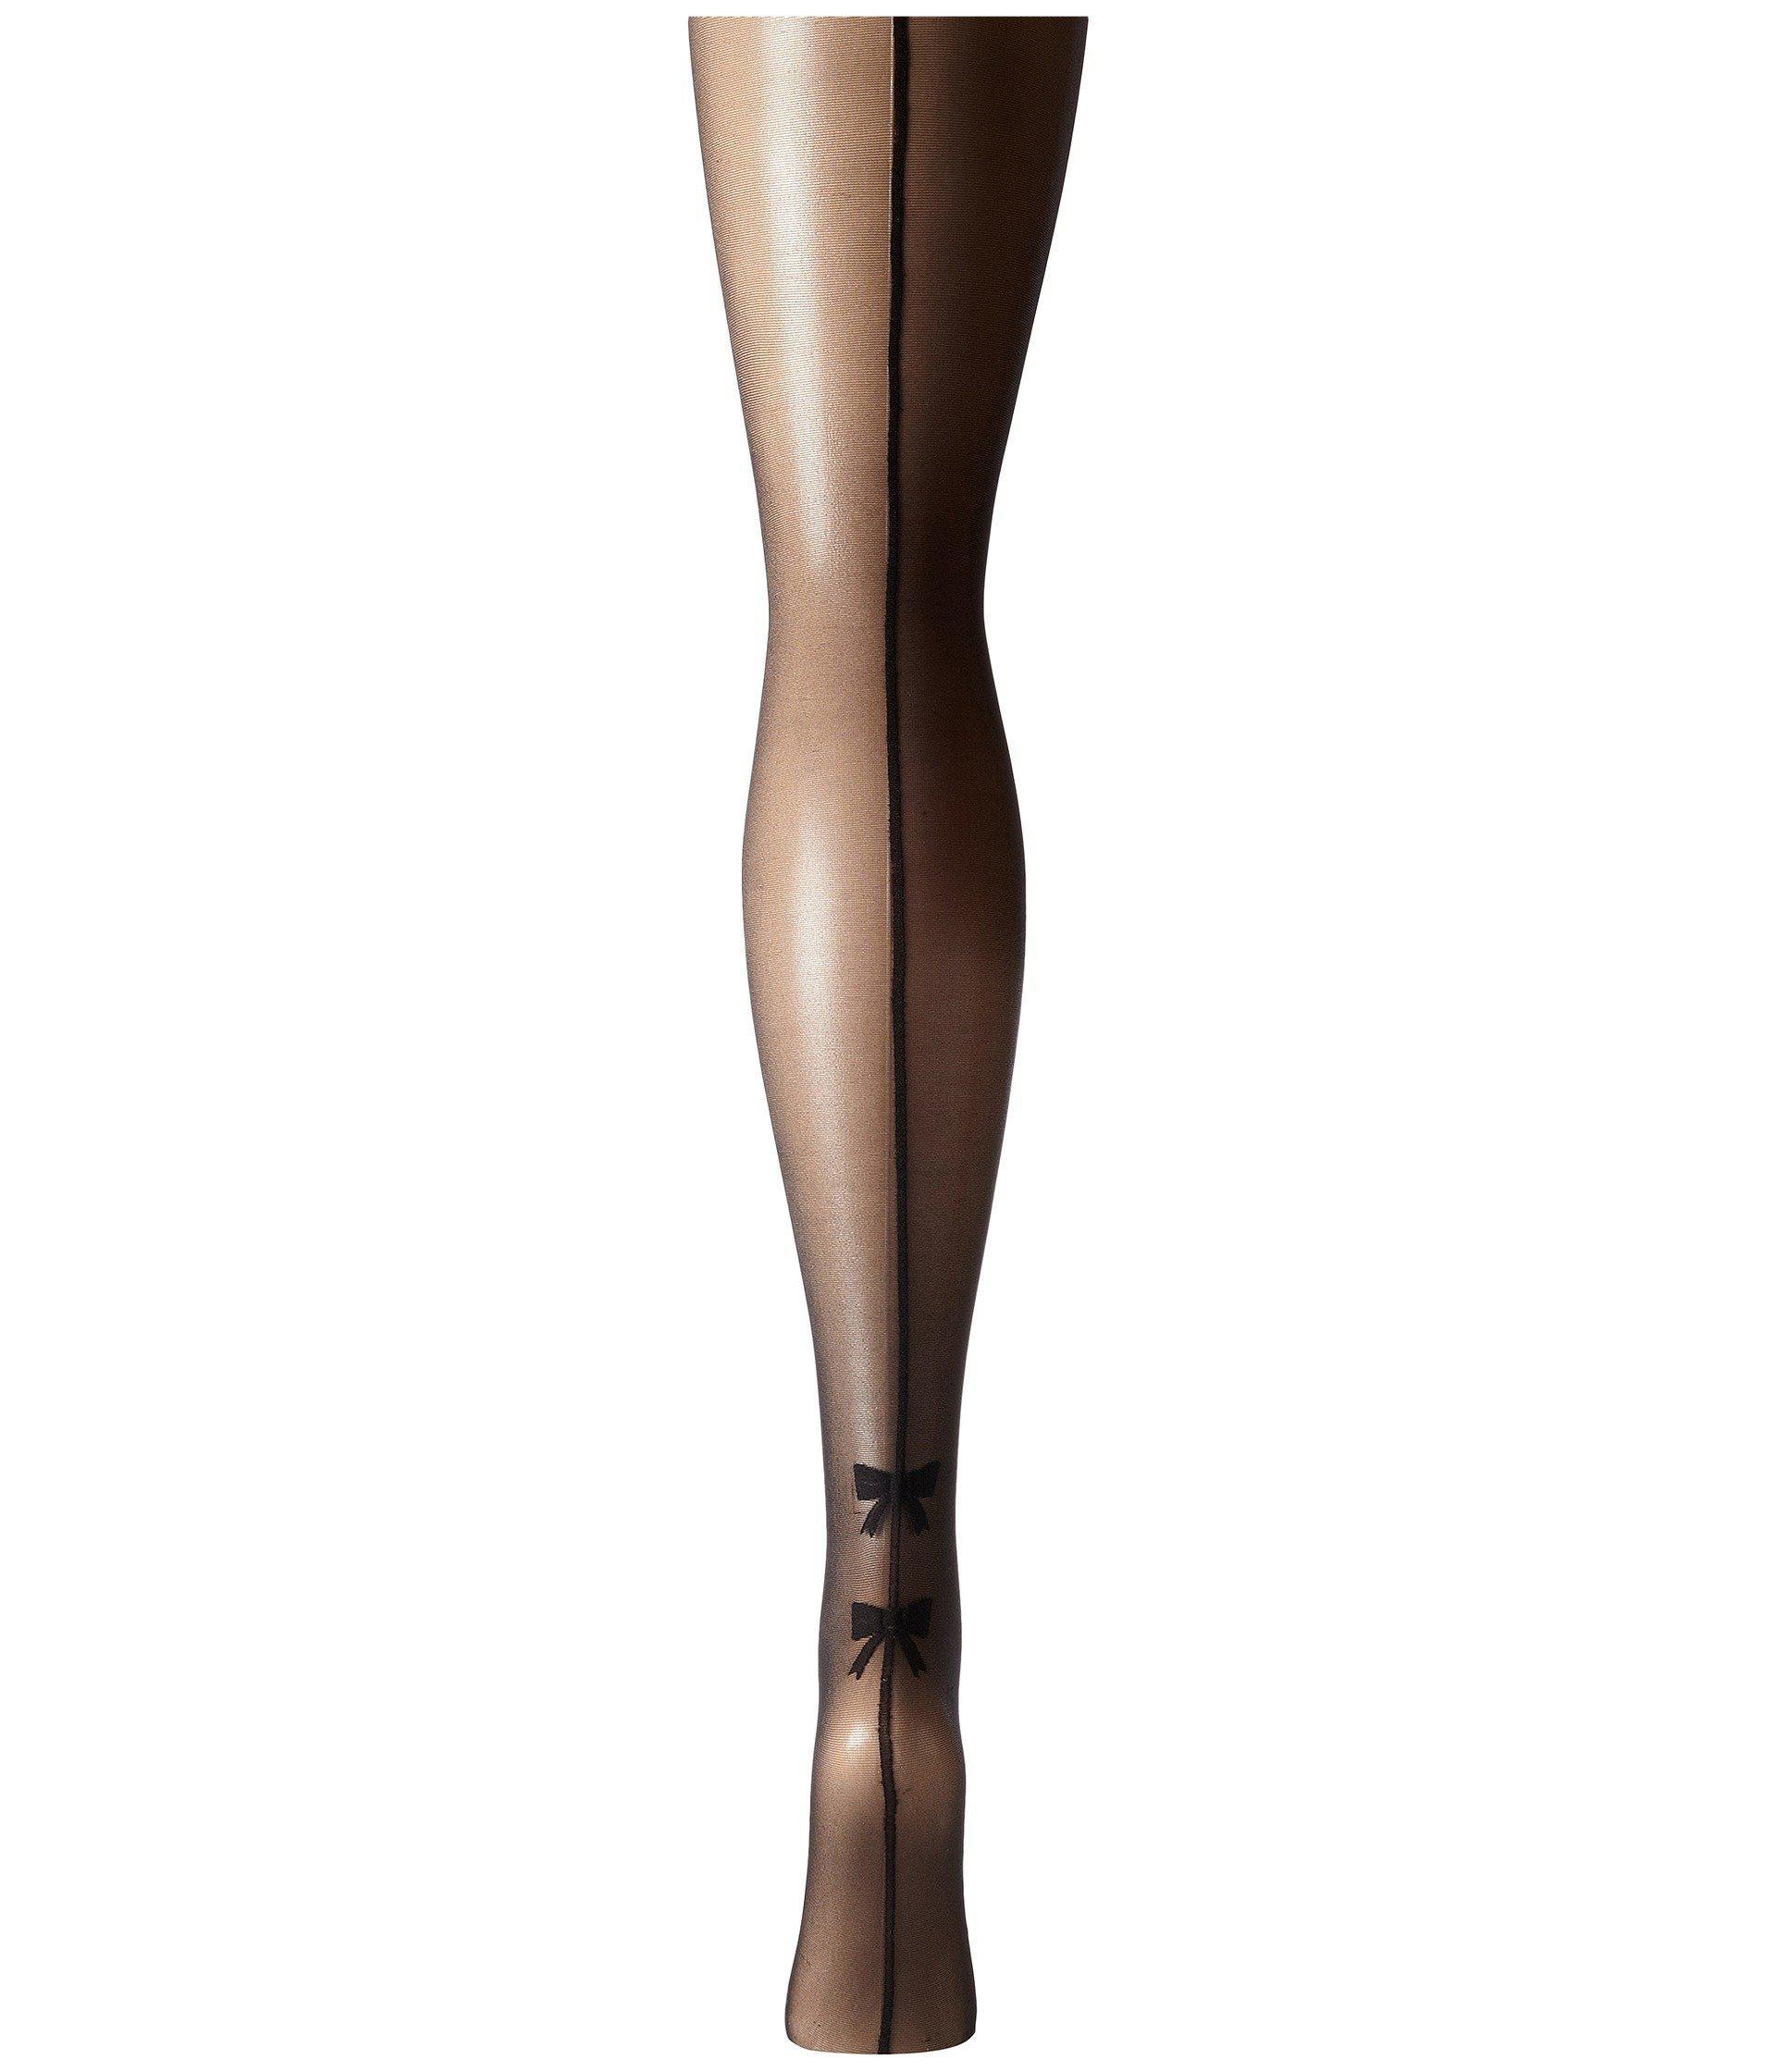 d59564bd2 Lyst - Pretty Polly Plus Size Curves Bow Backseam Tights (black ...